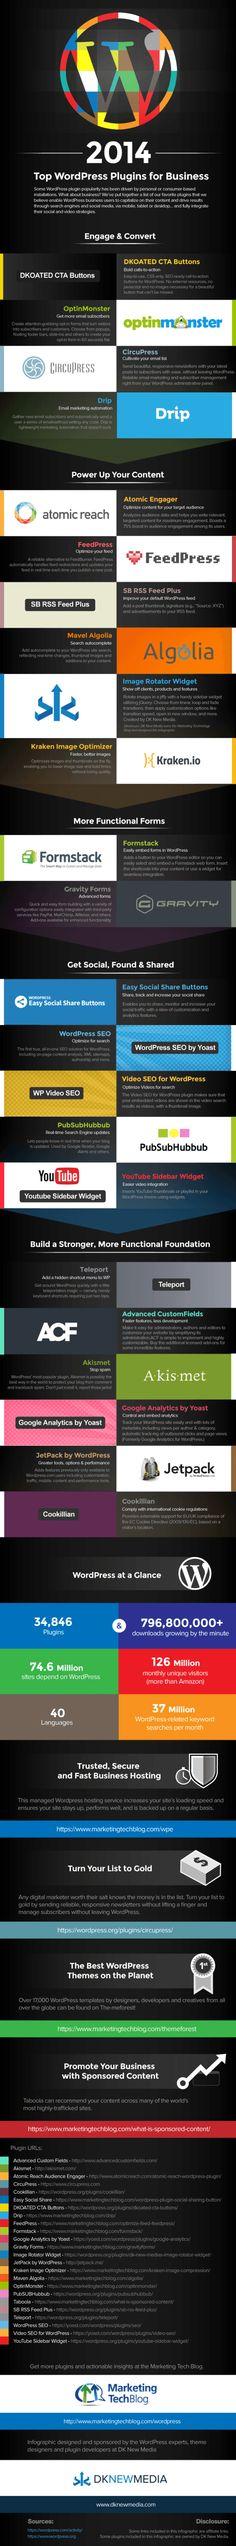 The Best WordPress Plugins for Business 2014 (Scheduled via TrafficWonker.com)